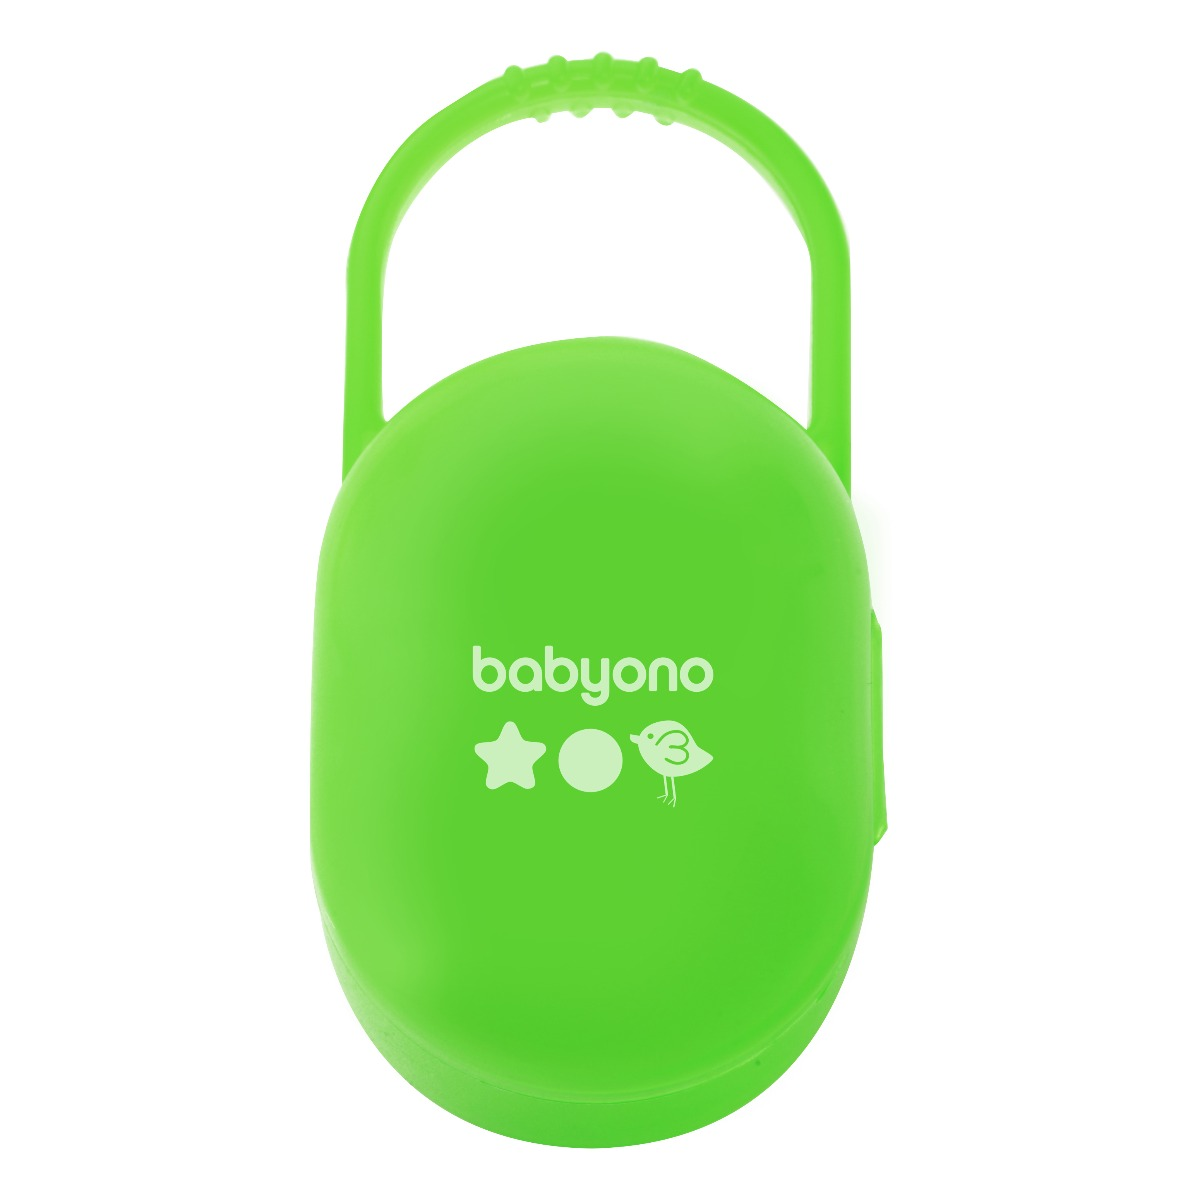 Cutie pentru suzeta BabyOno, Verde